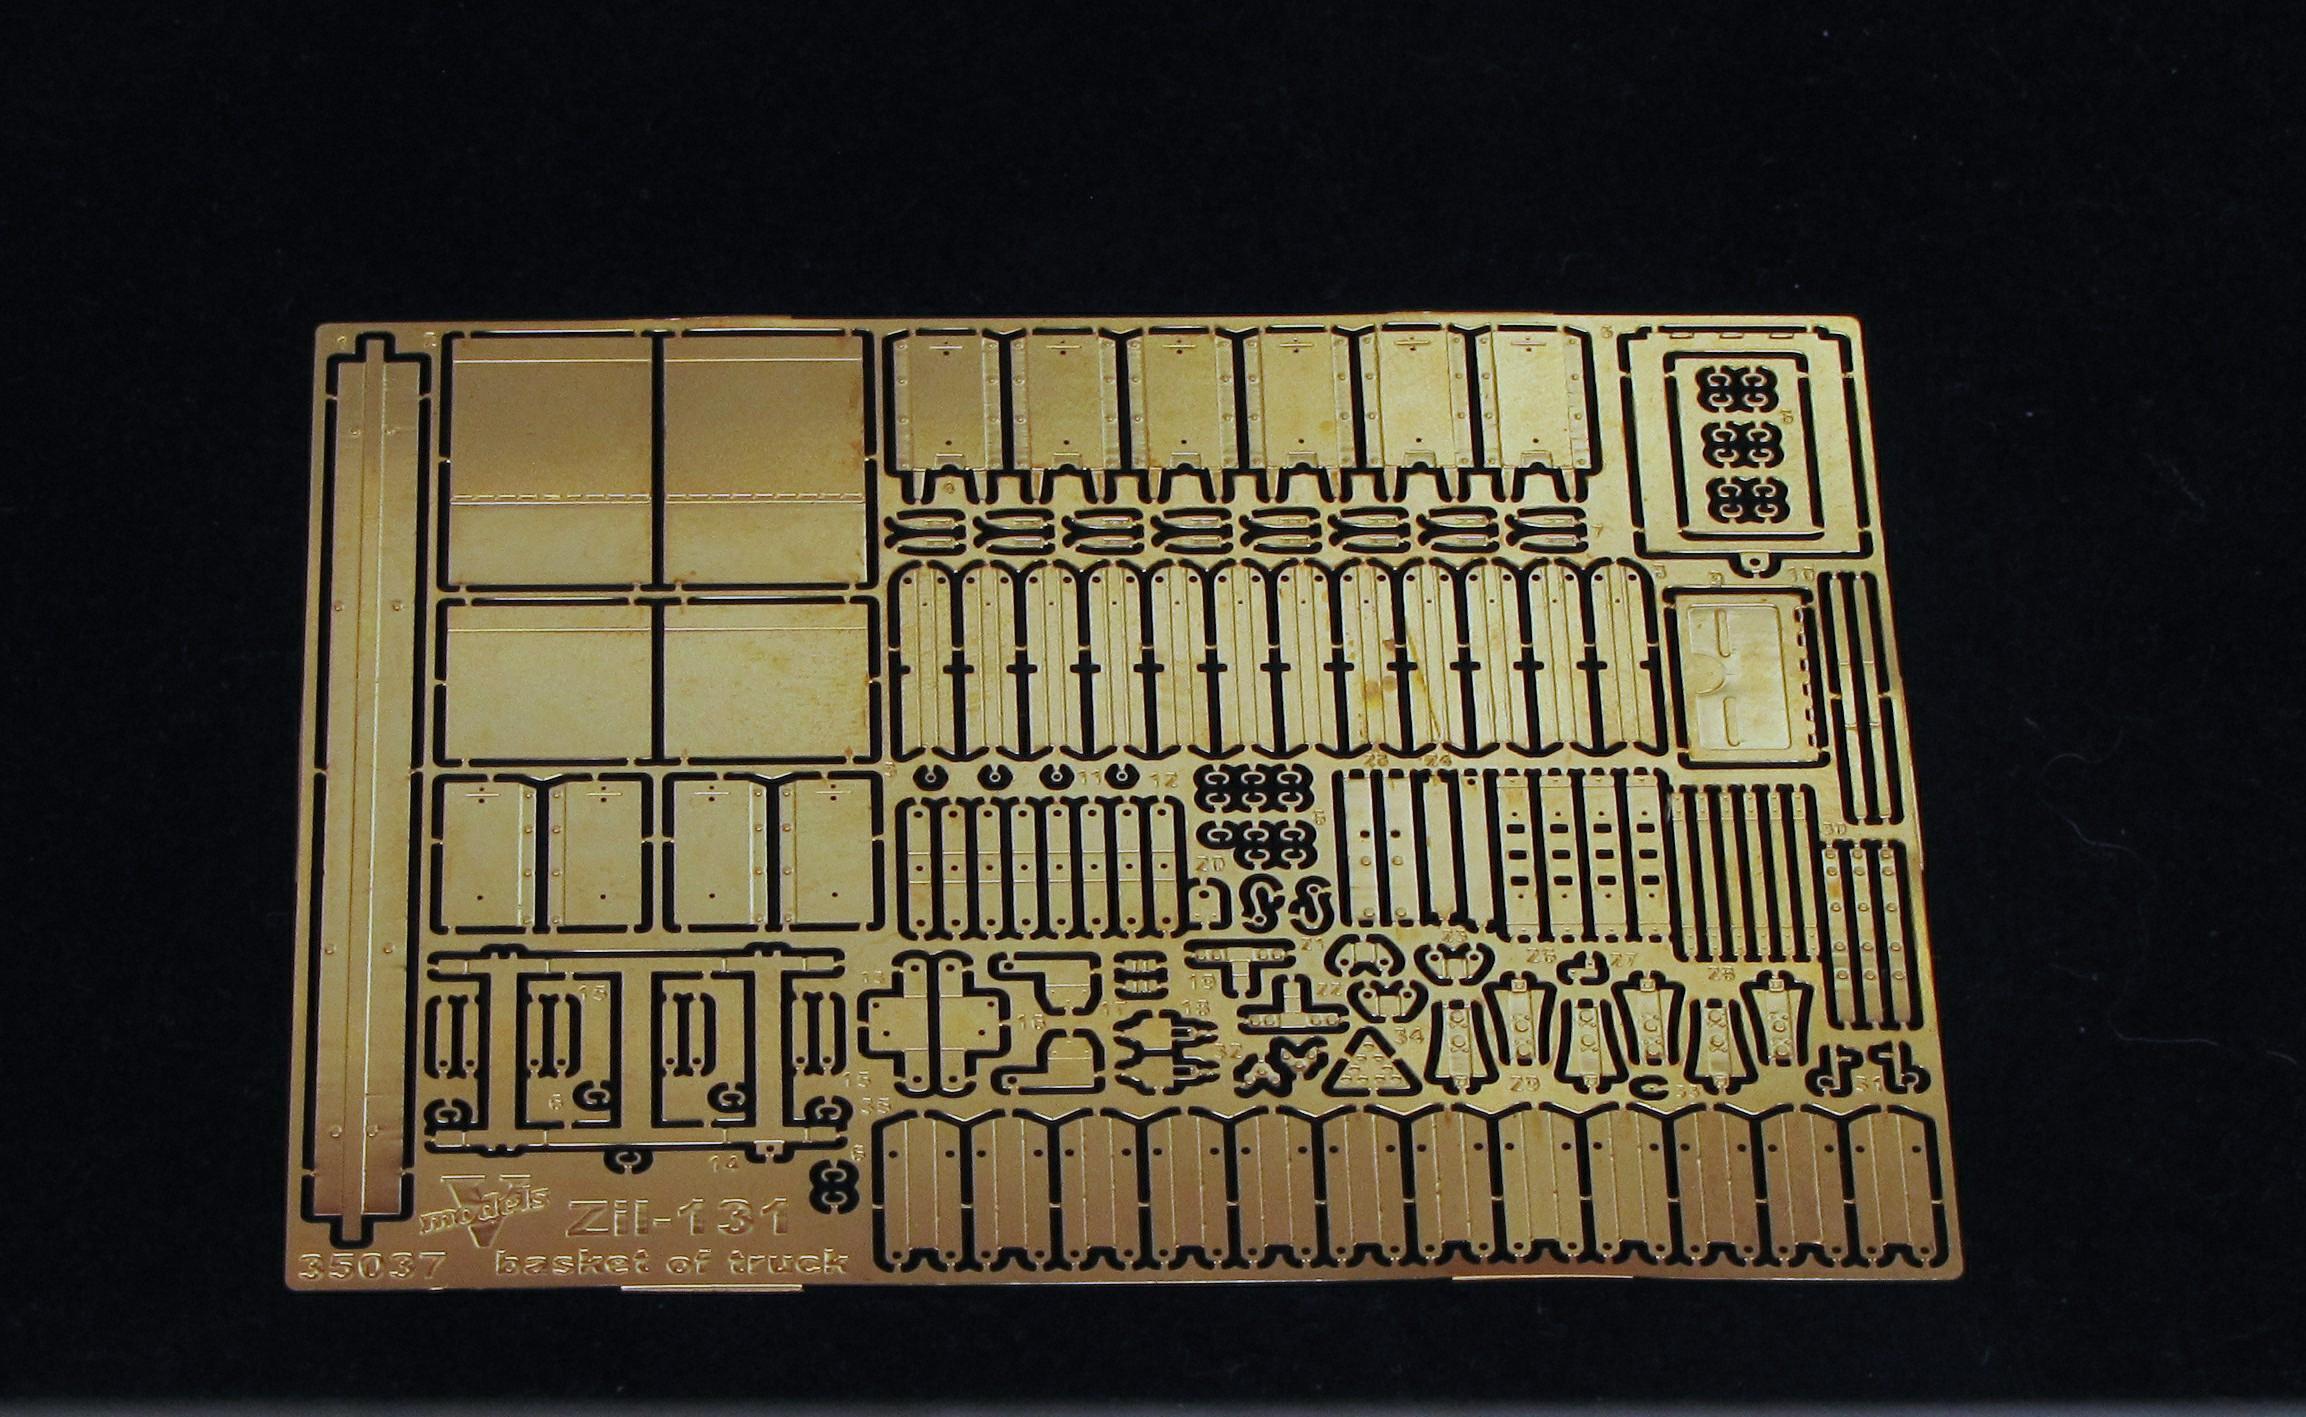 "ZiL - 131 basket of truck (""ICM"" model kit) 35037"